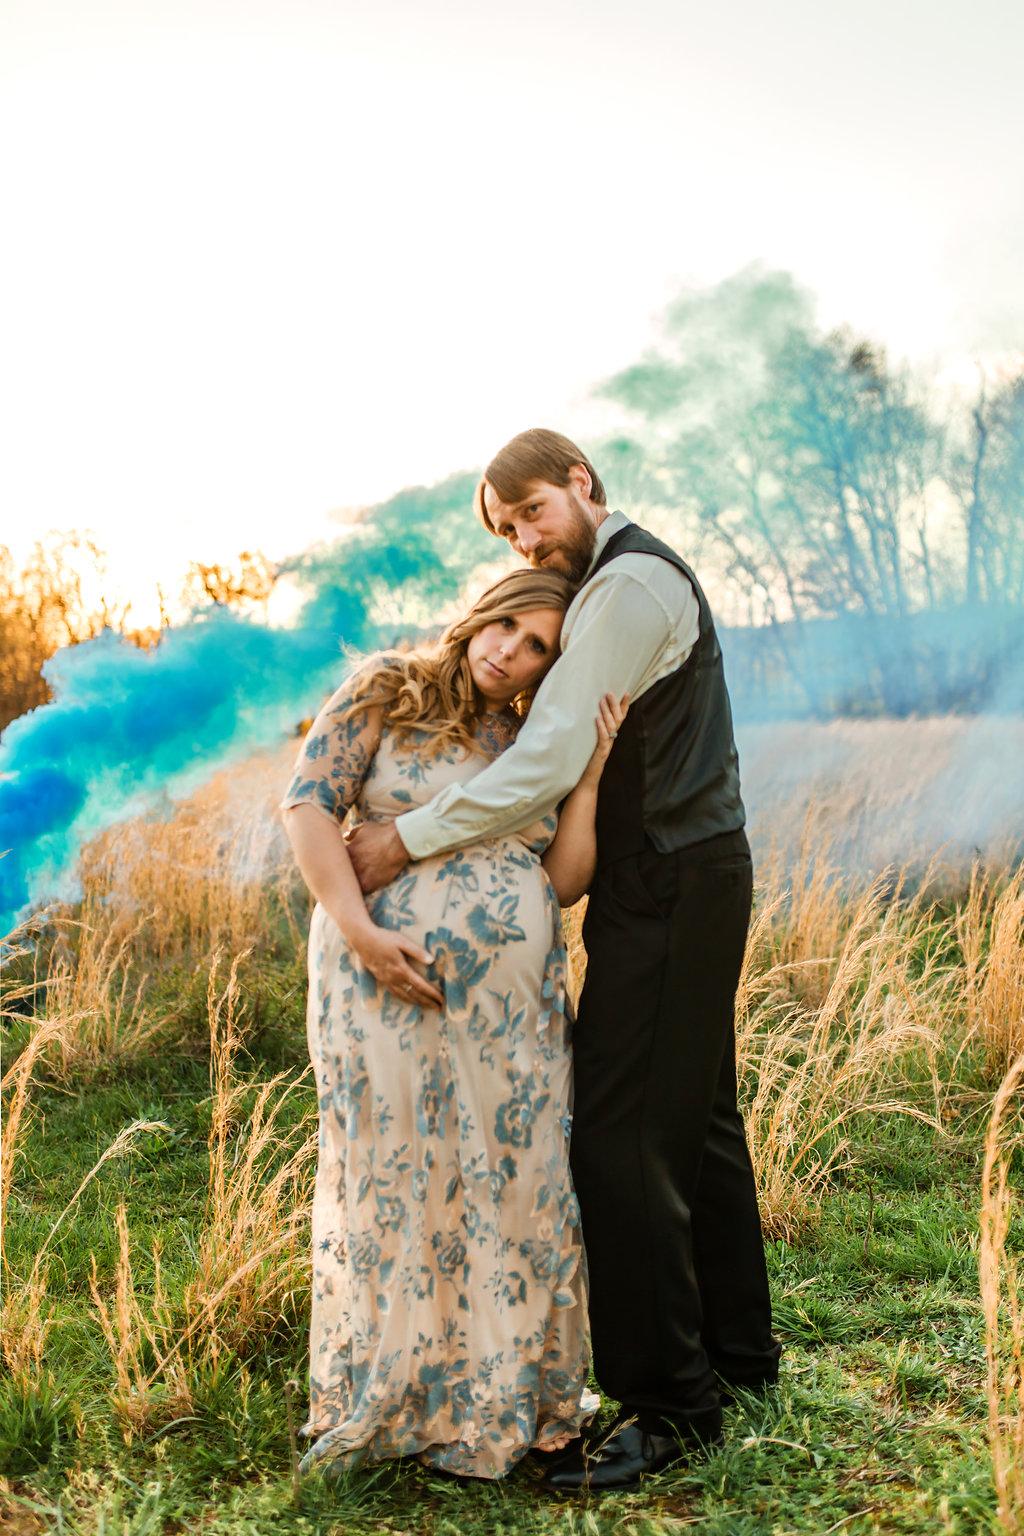 Franklin-Tennessee-Maternity-Styled-Floral-Dress-Field-Golden-Smoke-Grenade-Blue-Boy